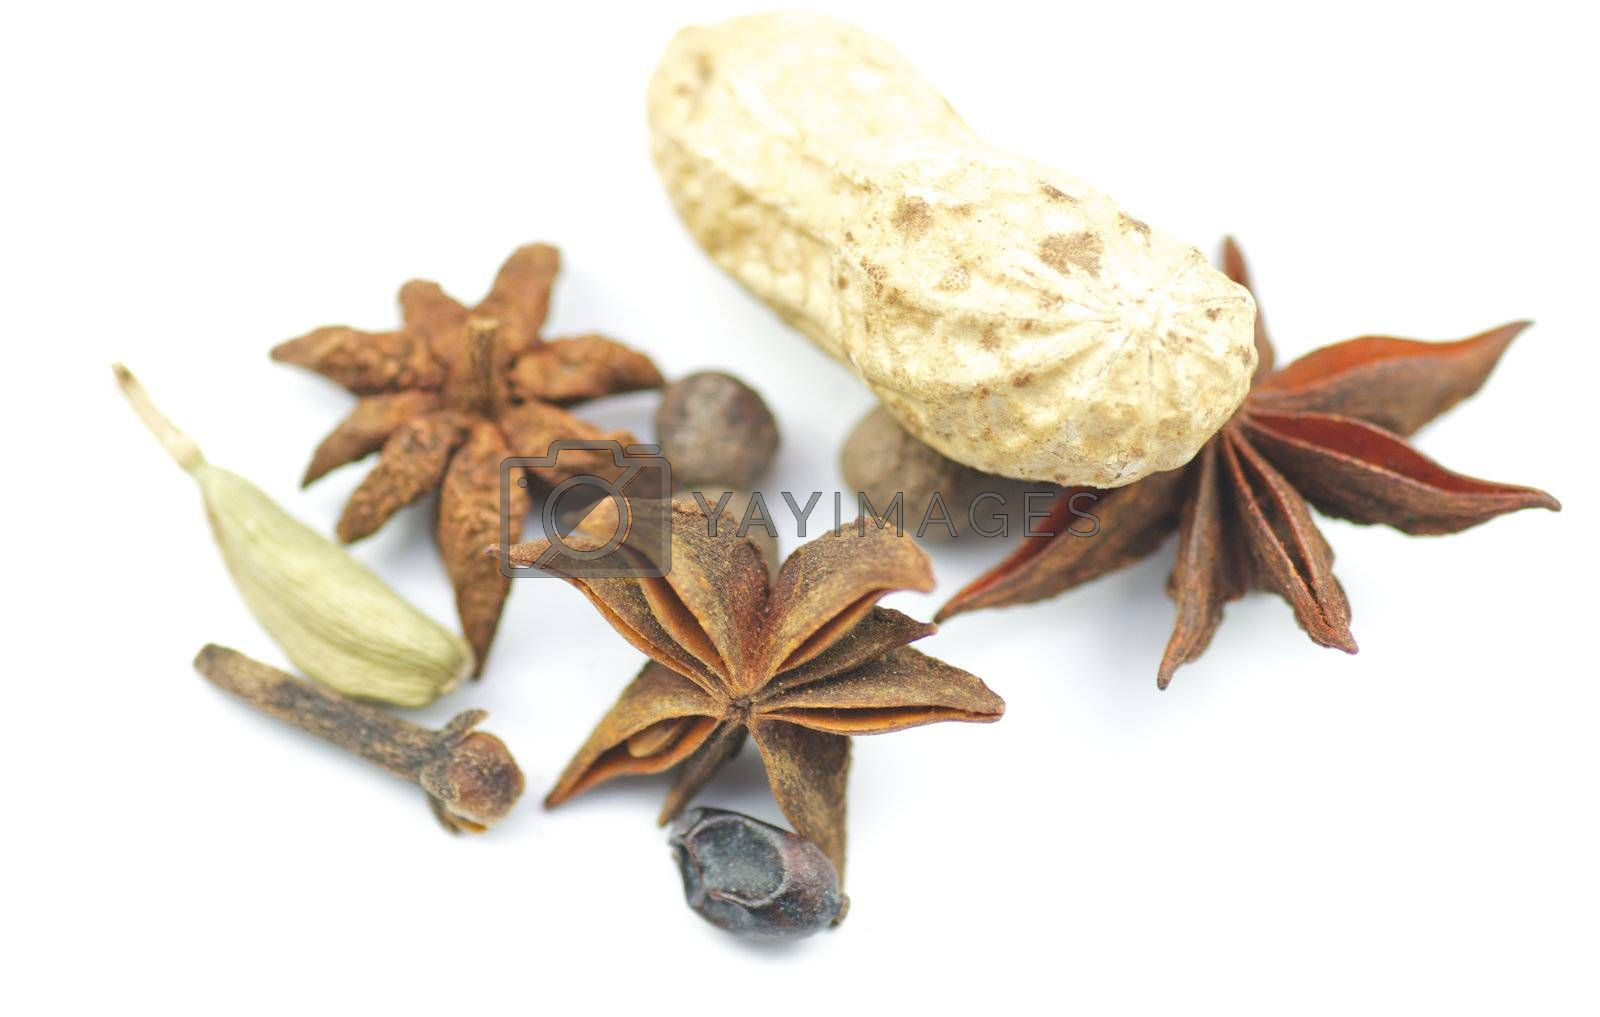 Anise, cardamon and nut isolated on white background